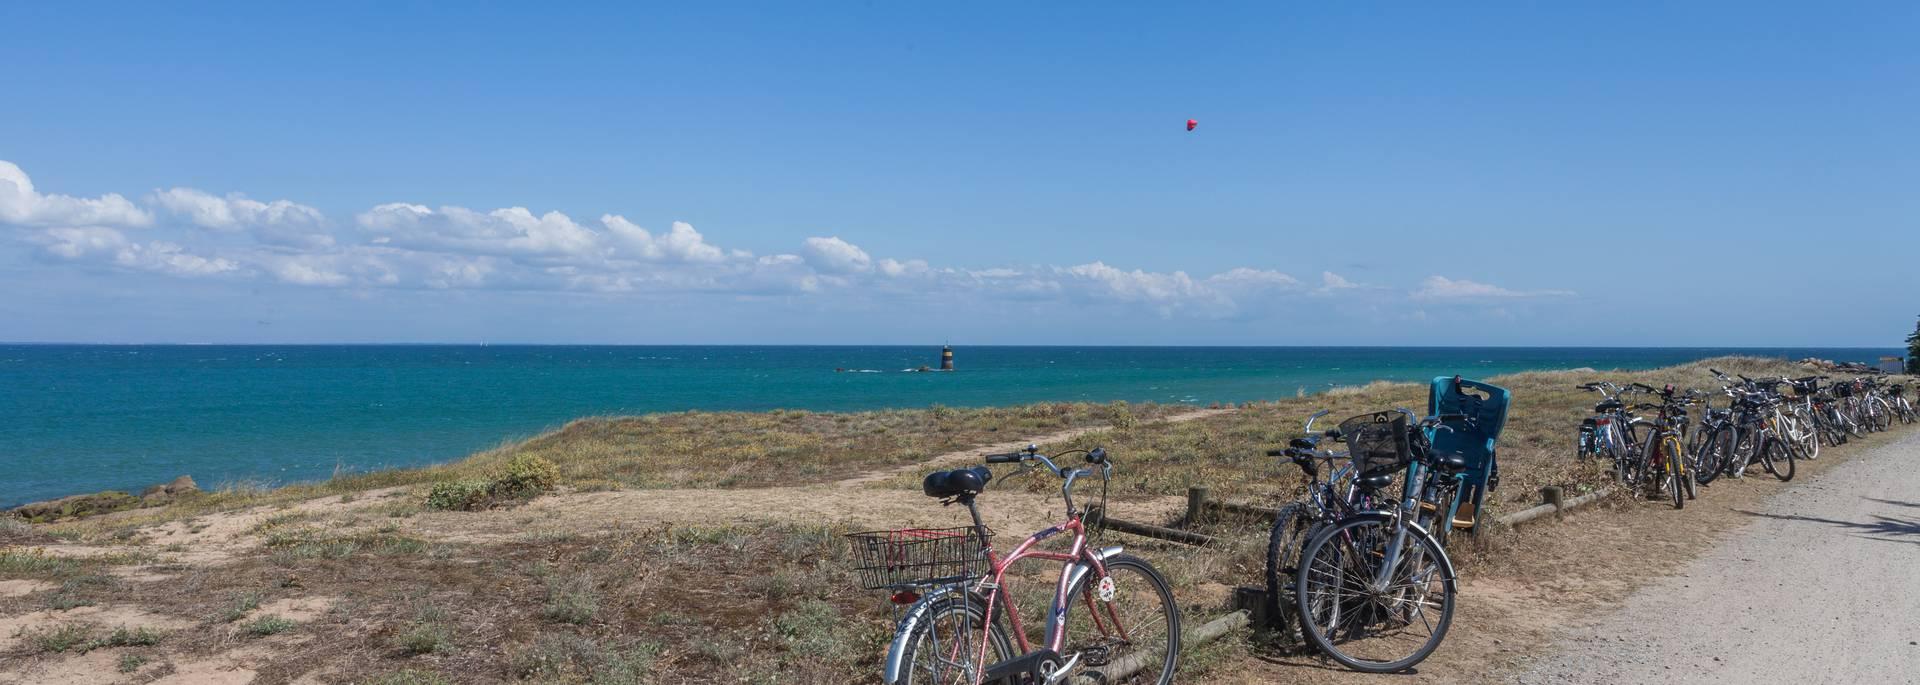 Bike riding on the Ile d'Yeu